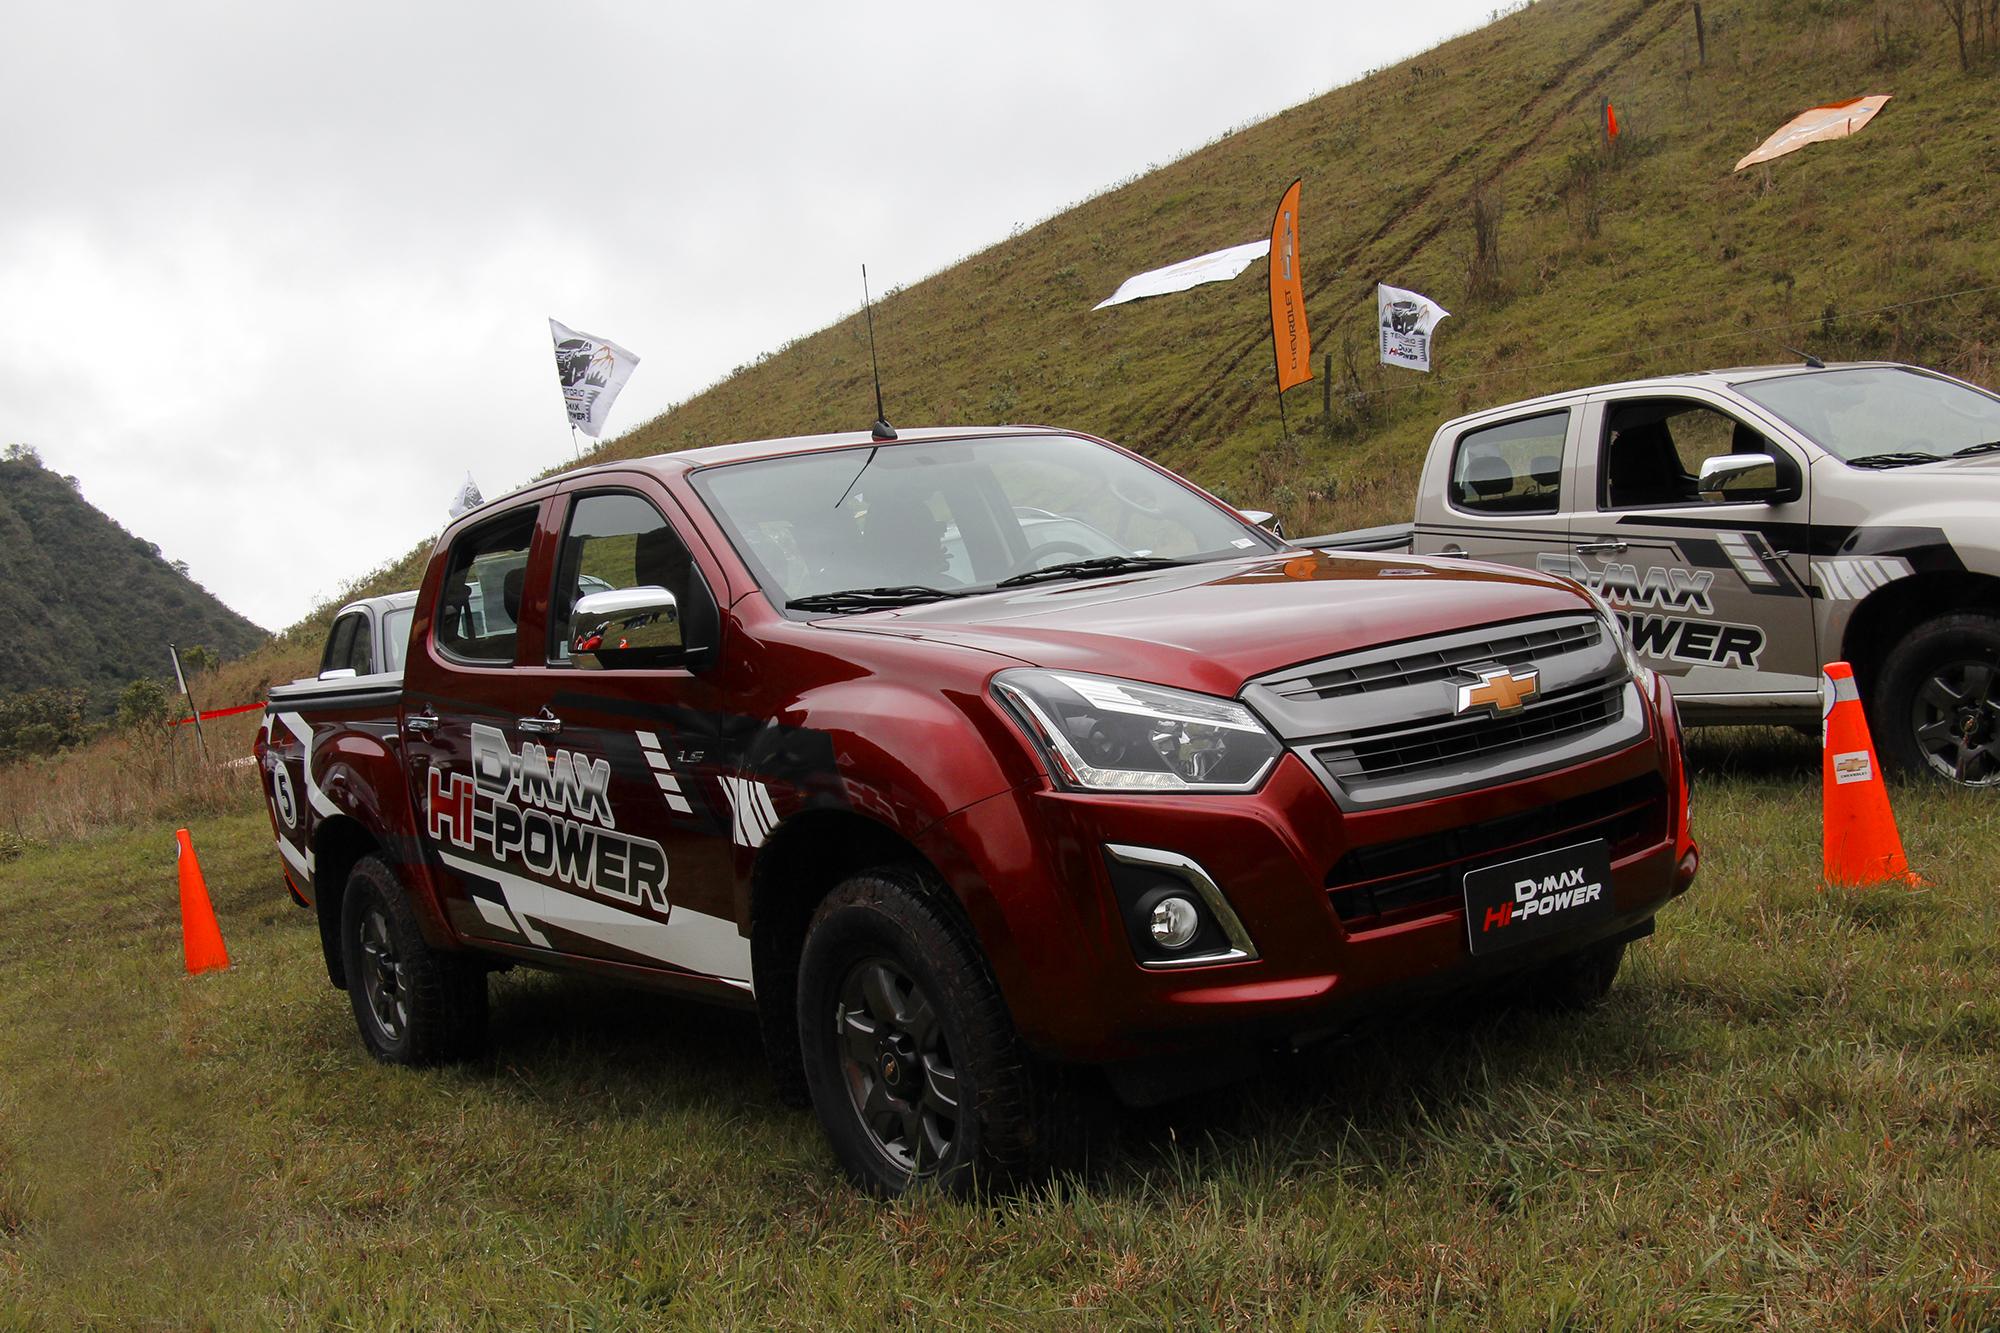 Chevrolet DMAX High Power-03